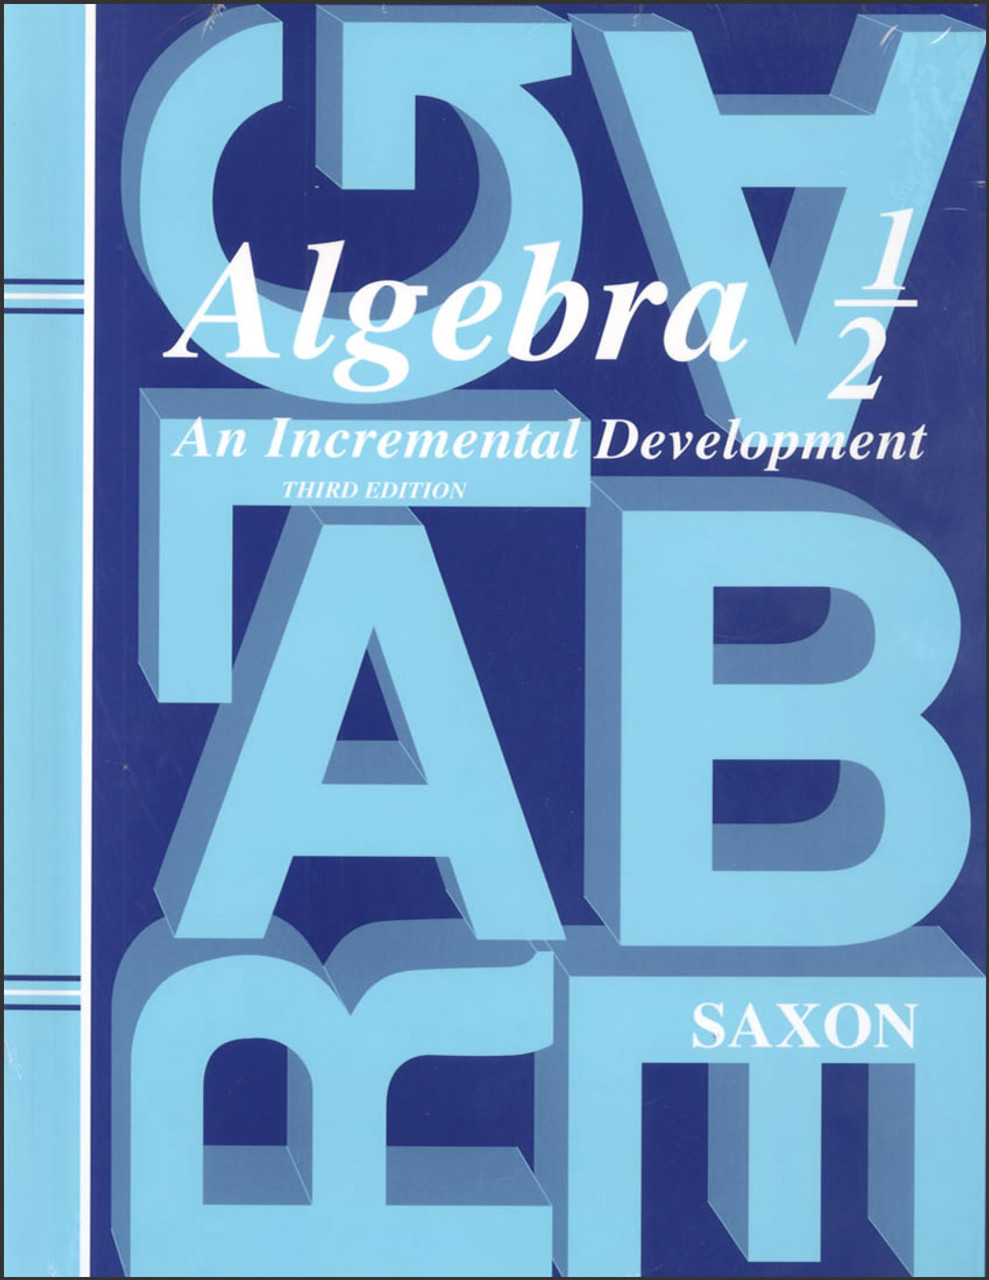 Algebra 1/2: An Incremental Development, 3rd edition